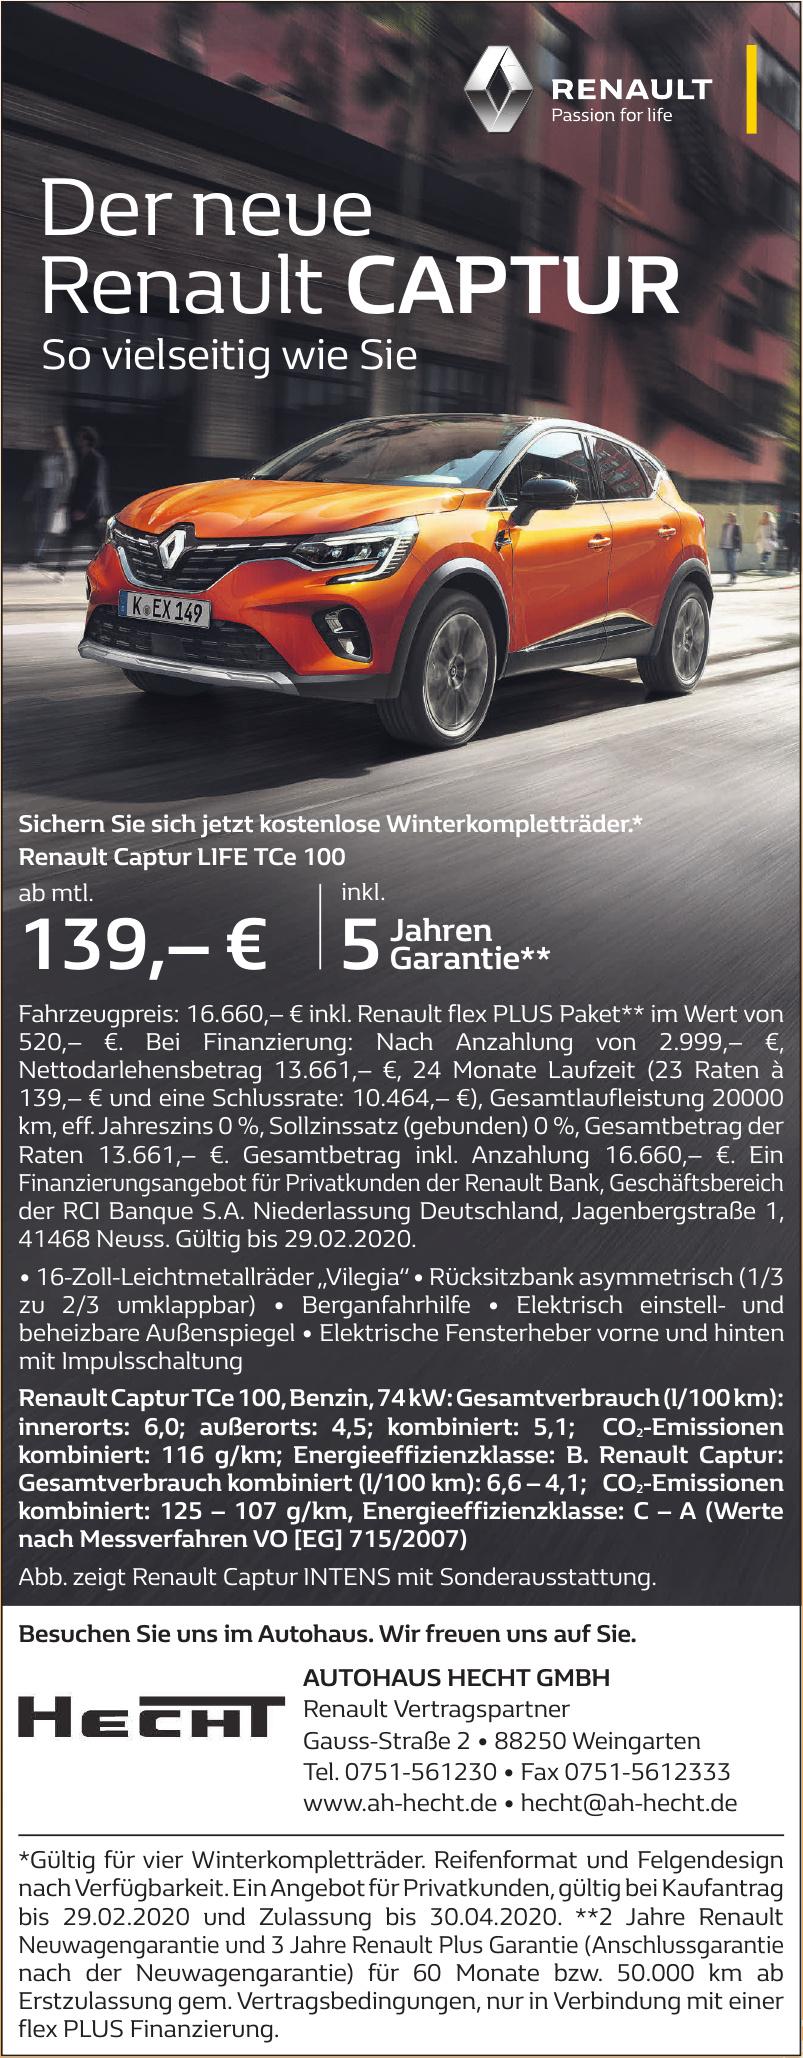 Autohaus Hecht GmbH